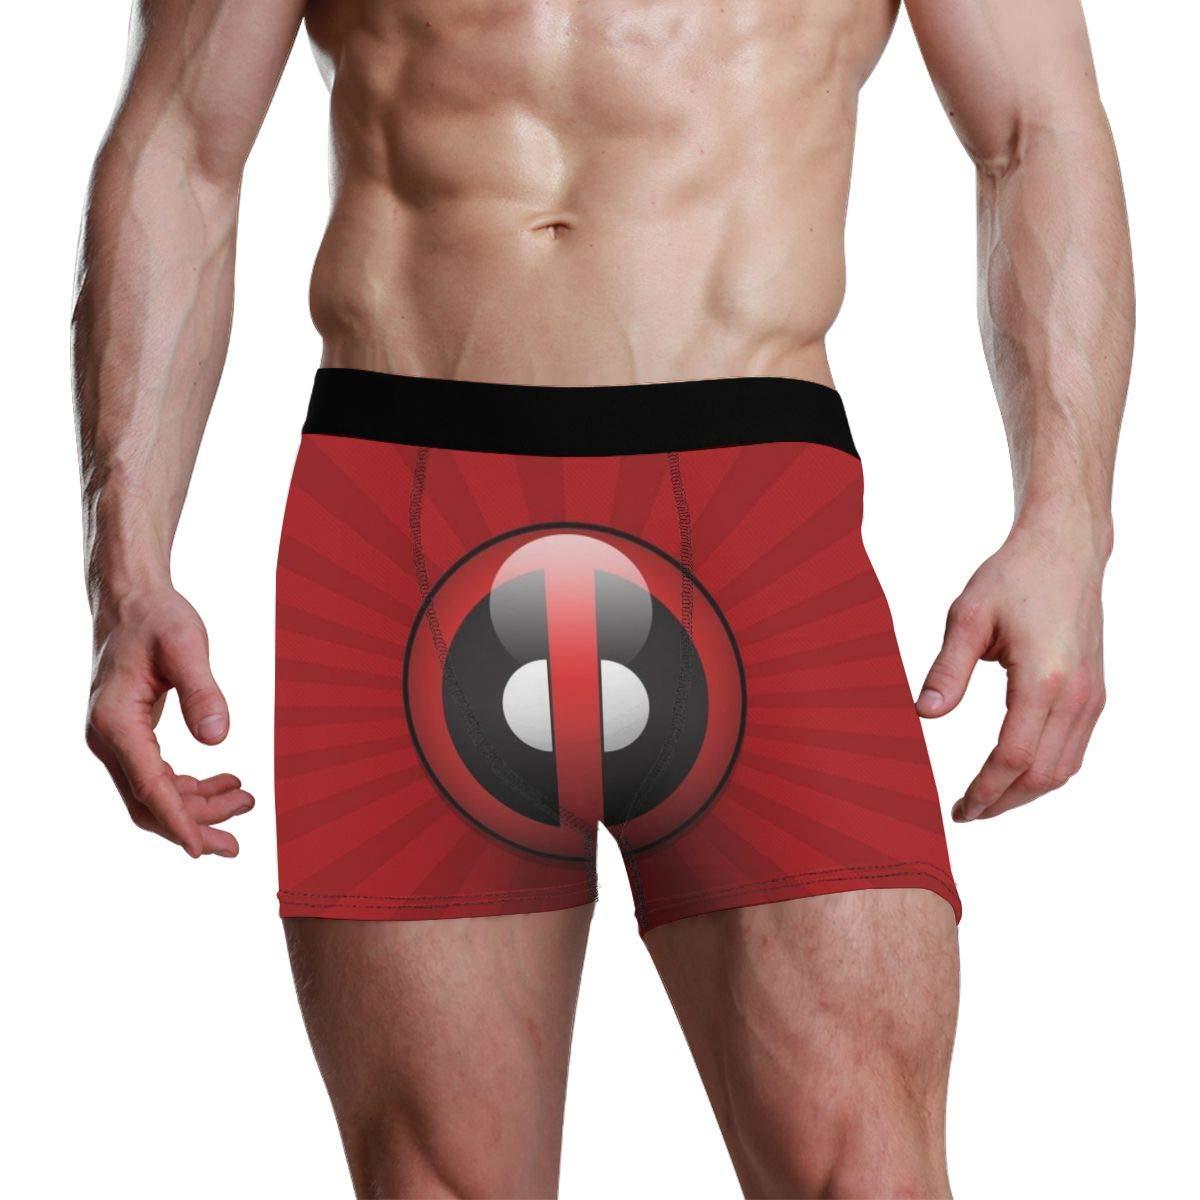 OPKSII MERC with A Mouth Headpool Boxer Briefs Mens Underwear Pack Seamless Comfort Soft